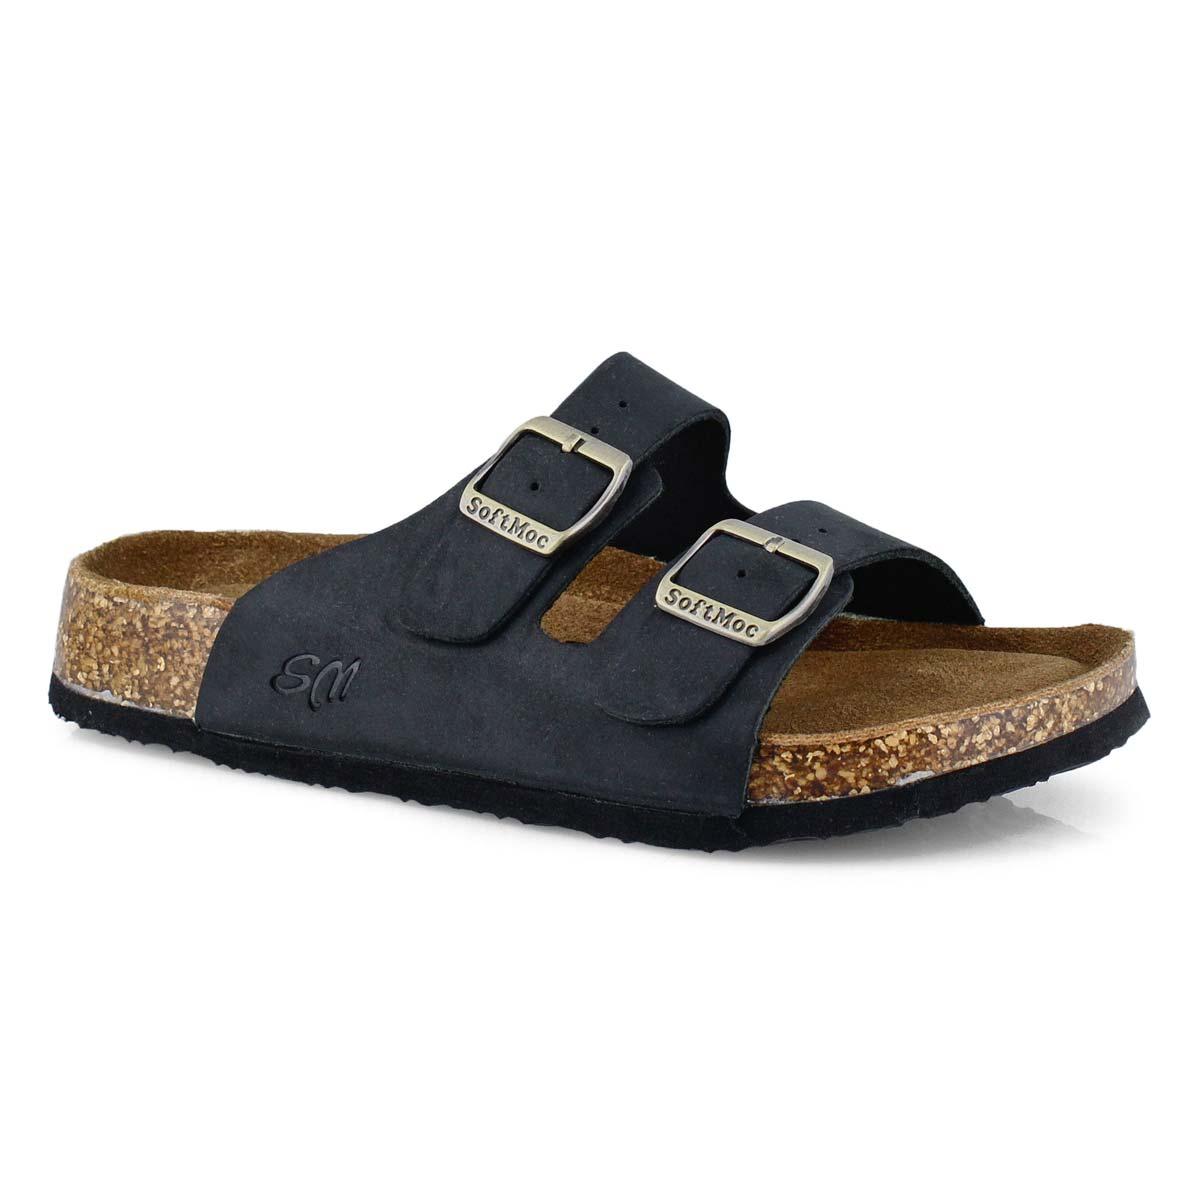 Women's ANNA 5 black memory foam slide sandals